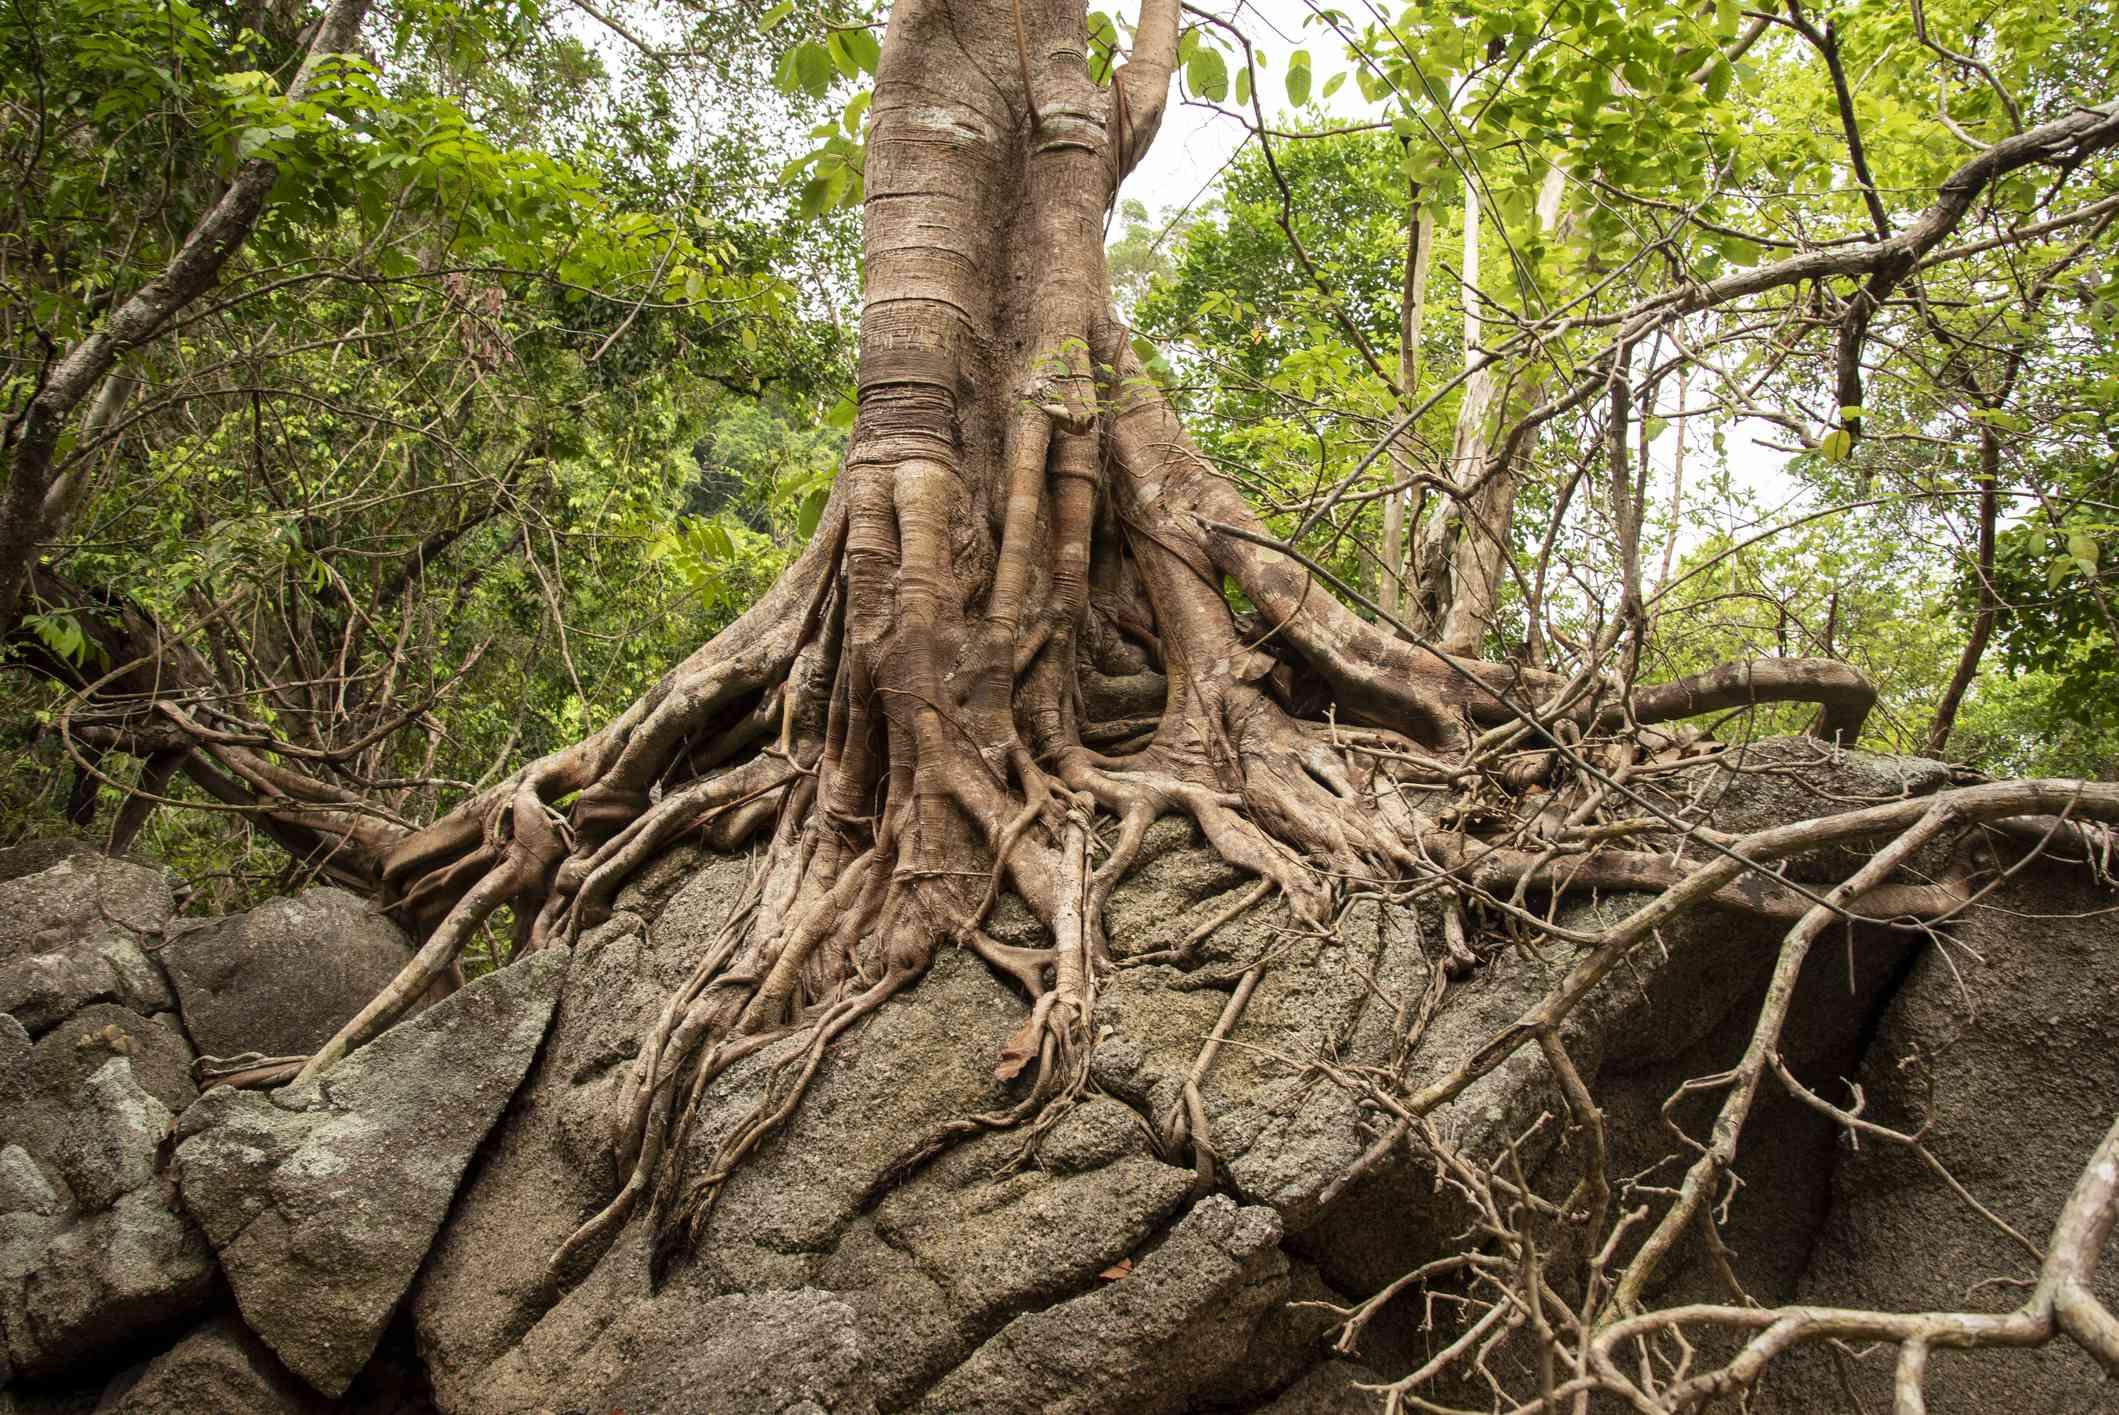 Banyan root